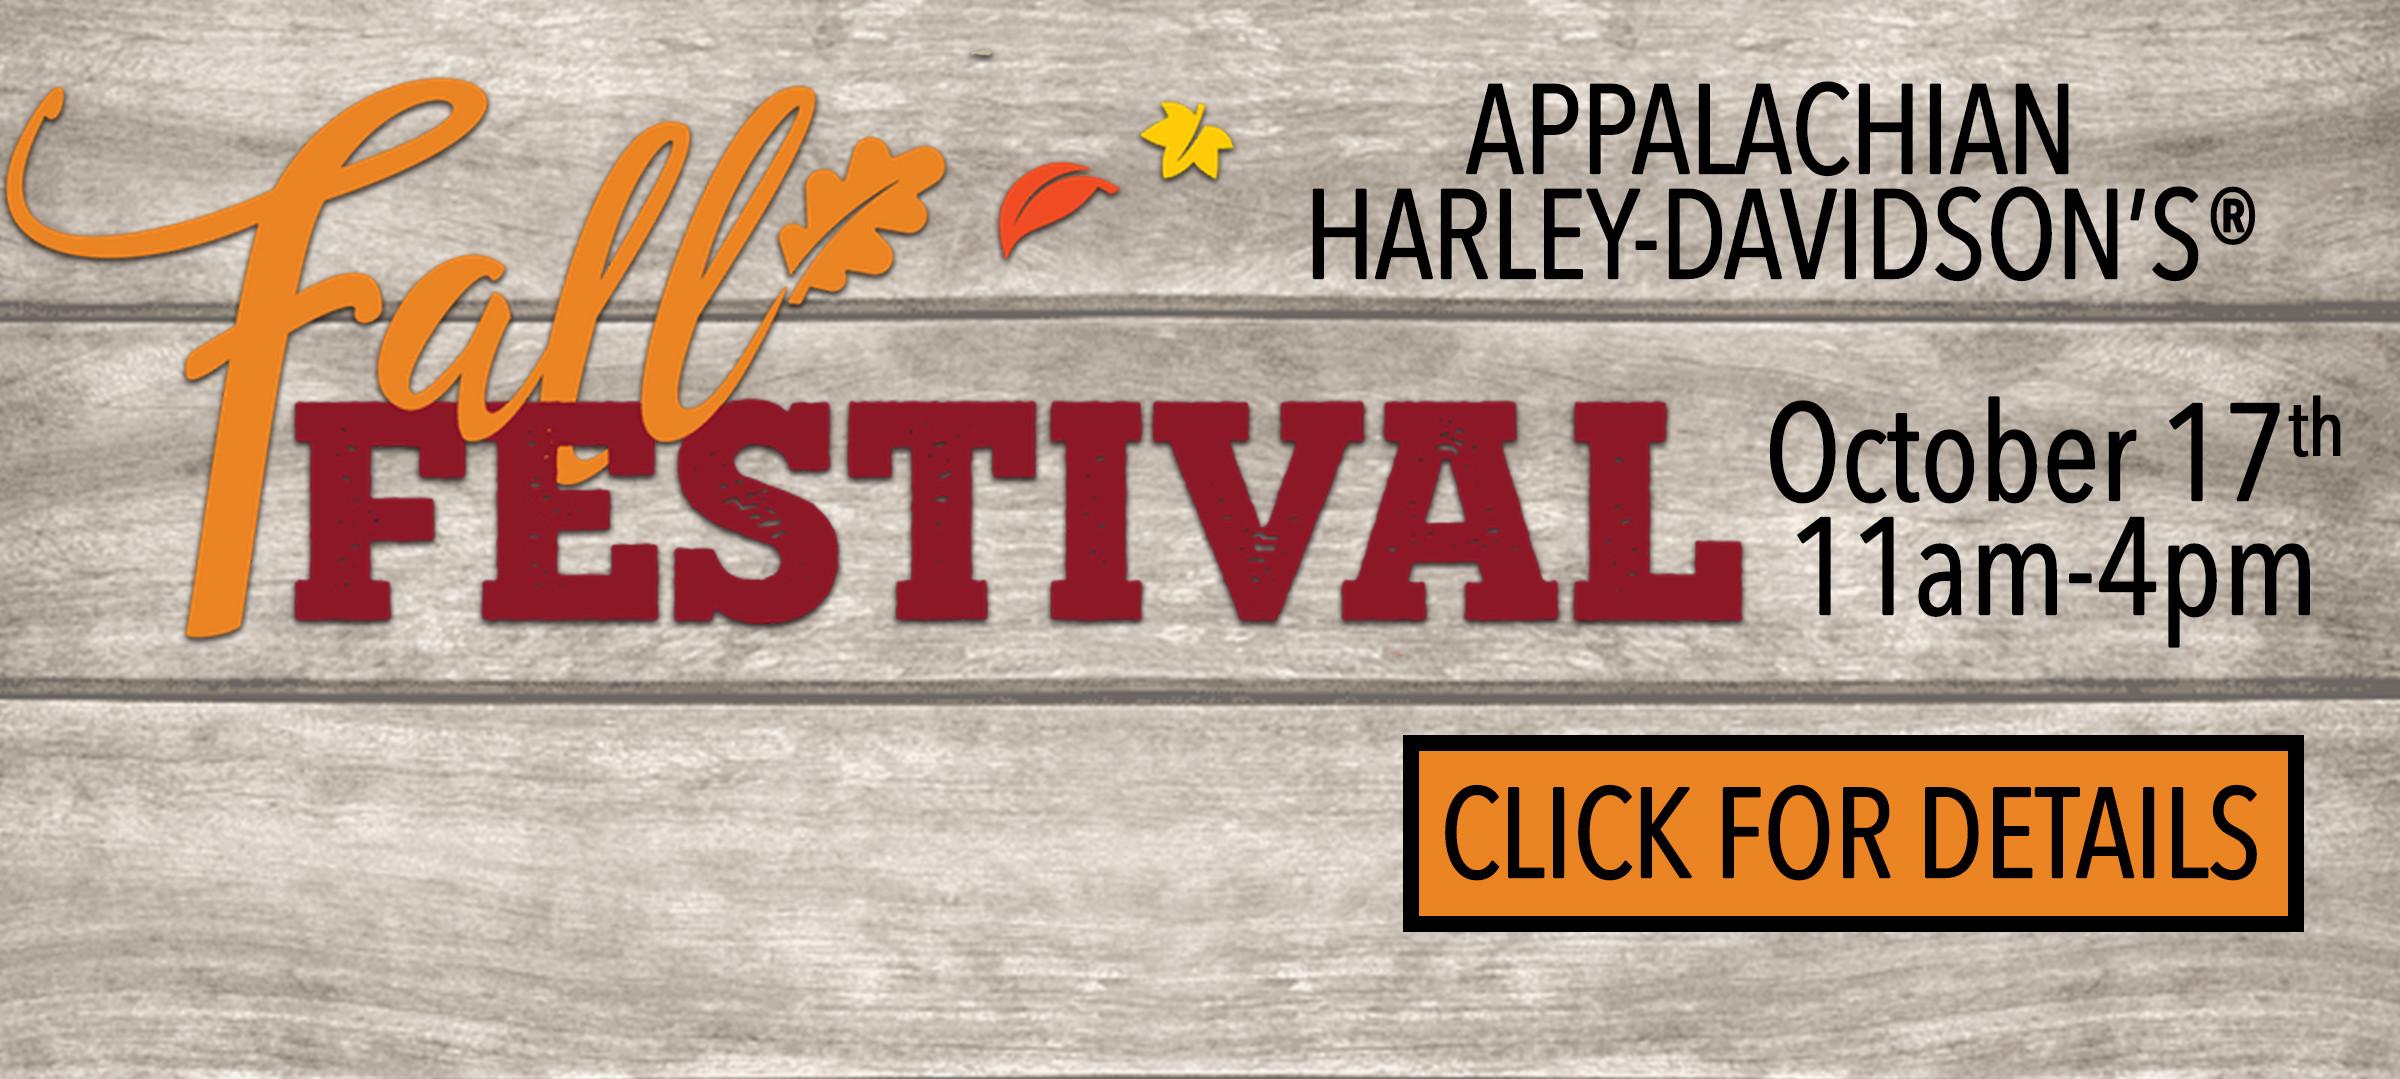 Christmas Toys For Tots Harley Davison 2020 Buy a Harley Davidson®! | Mechanicsburg, PA | Appalachian Harley